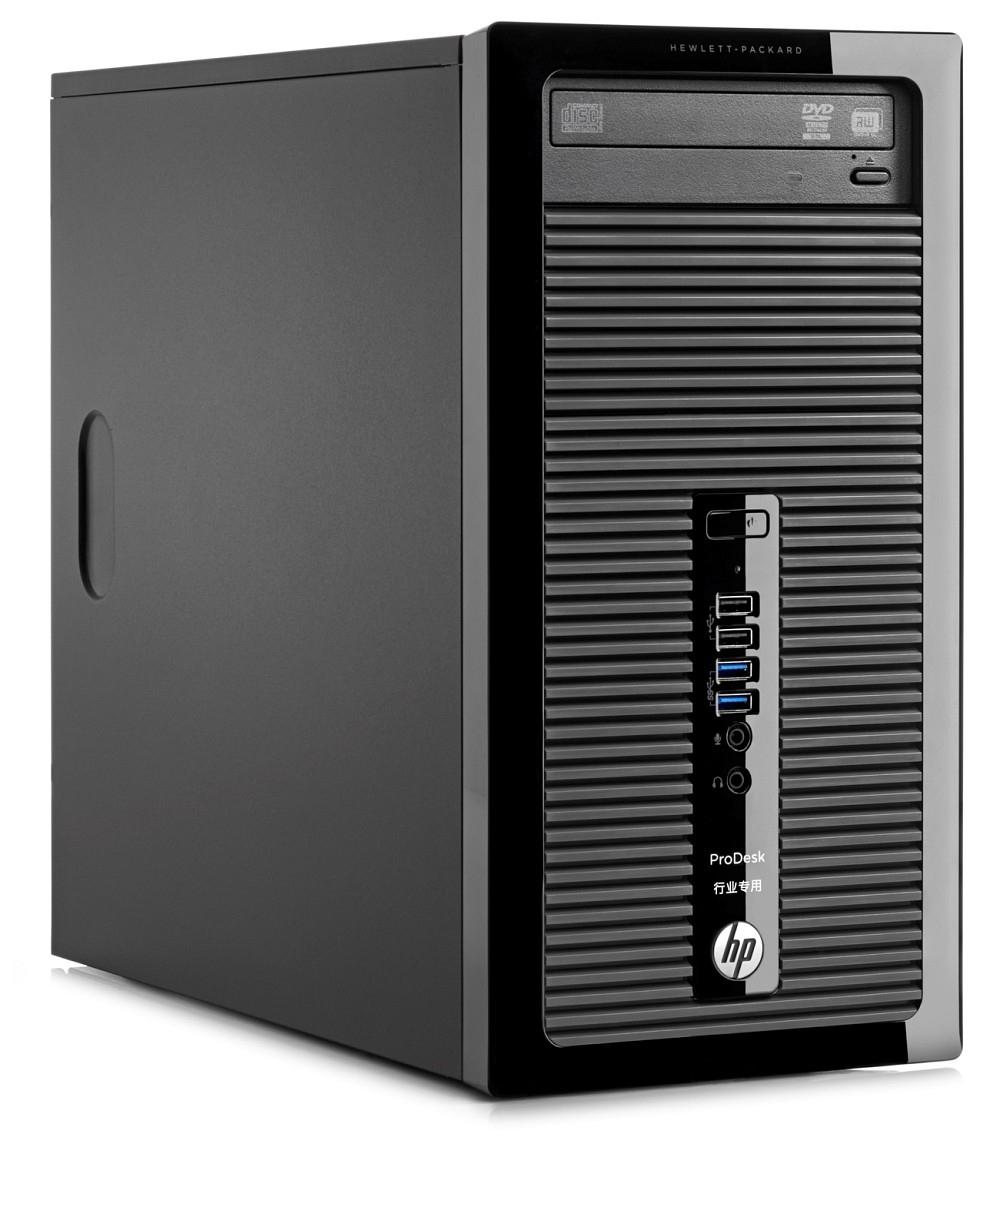 HP-ProDesk-400-g3-i3-4go-500go-HDD-w10